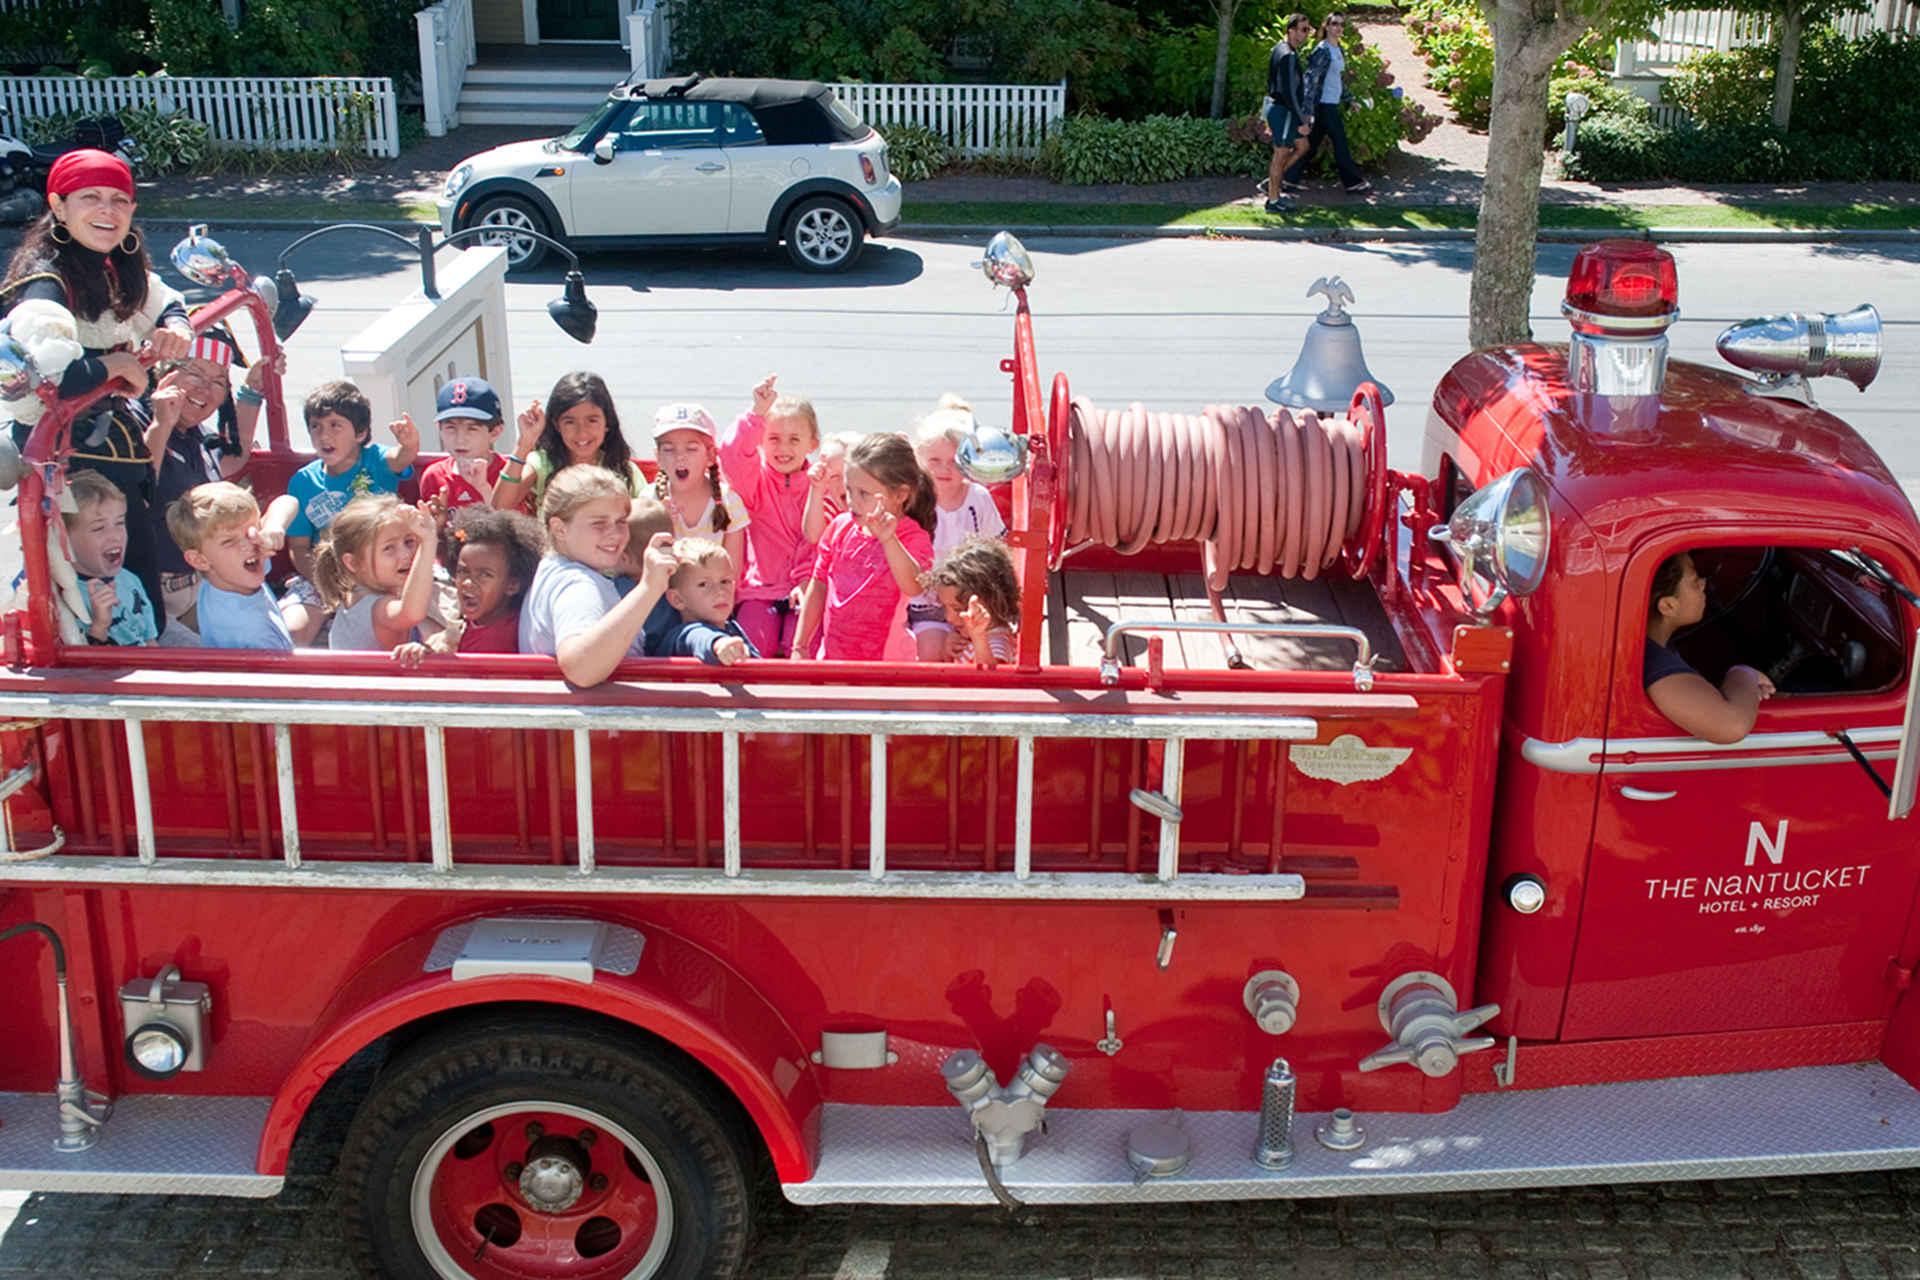 Nantucket Hotel and Resort Kids' Club